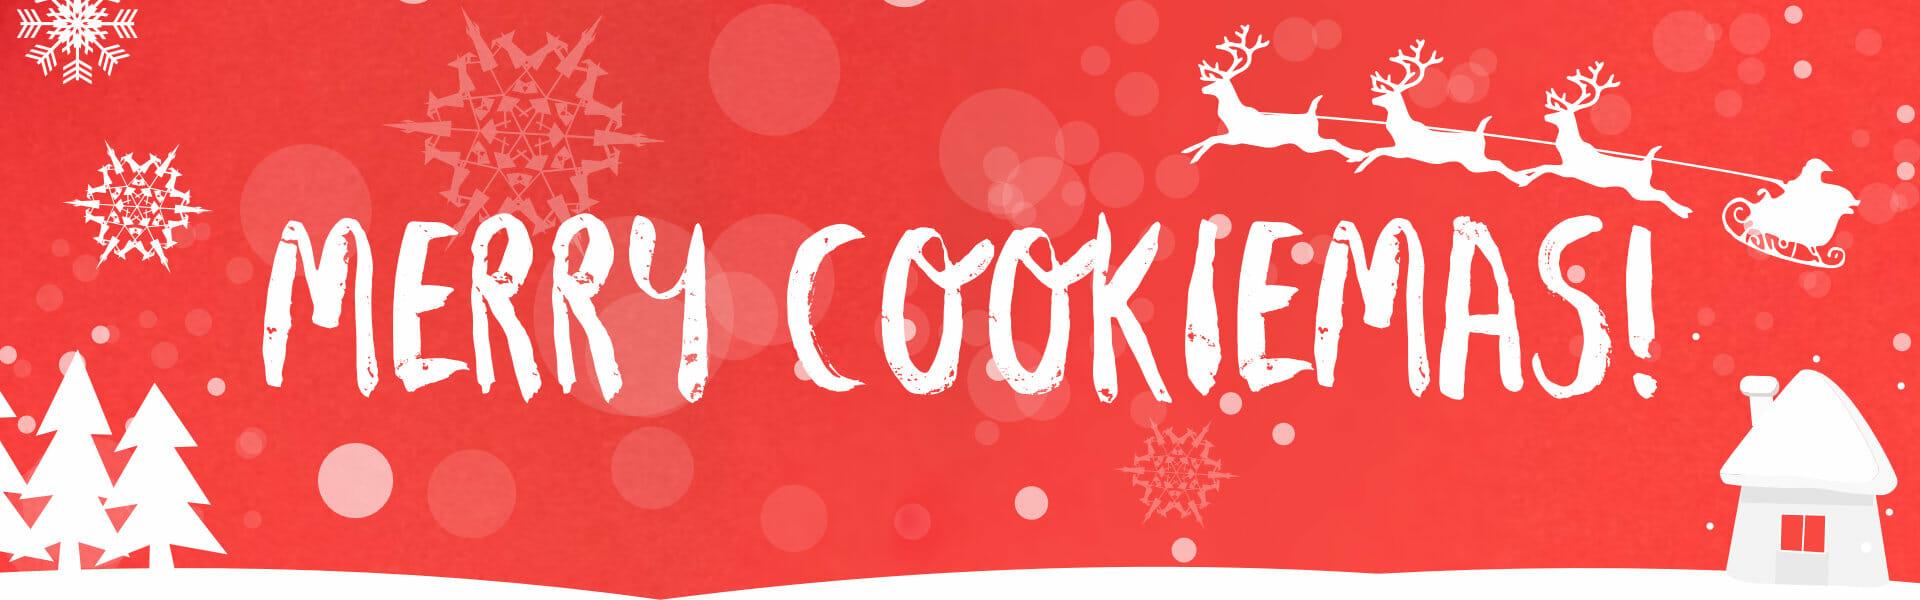 Merry Cookiemas